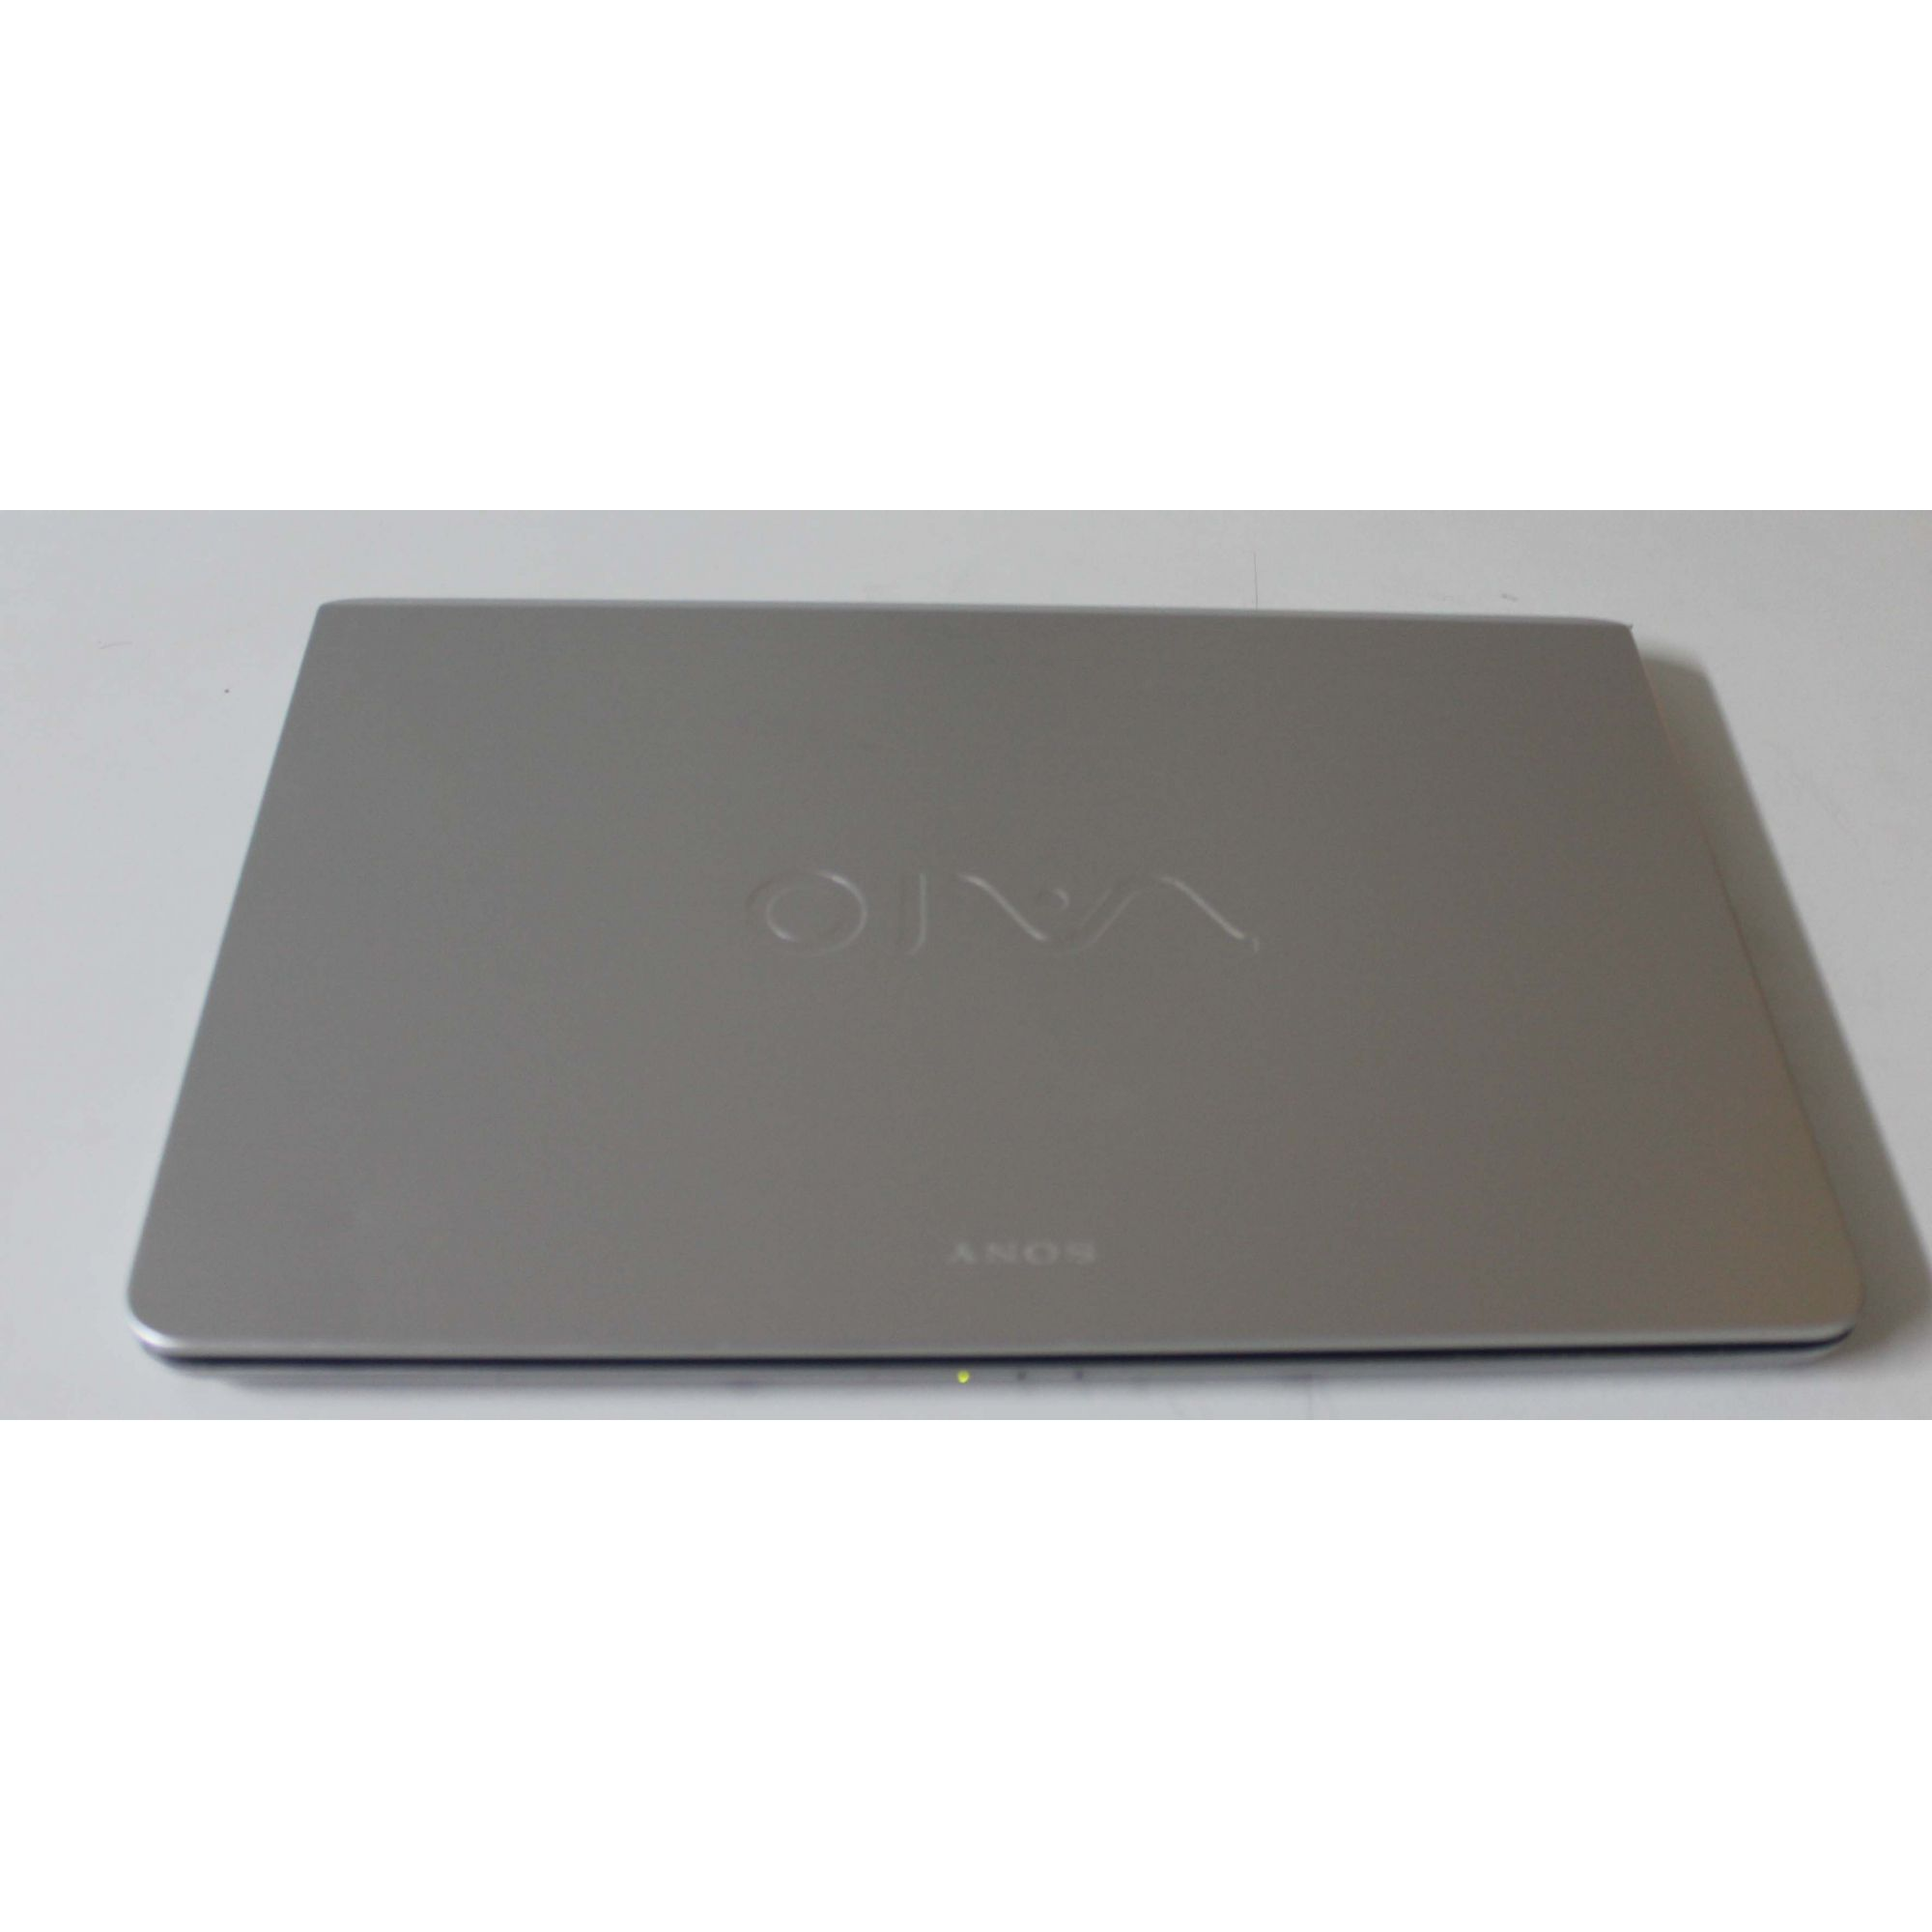 Notebook Sony Vaio SVF14A17PBS 14'' Core i7 2GHz 6GB HD-750GB + 1GB Dedicada (Touch) (Não Enviamos)